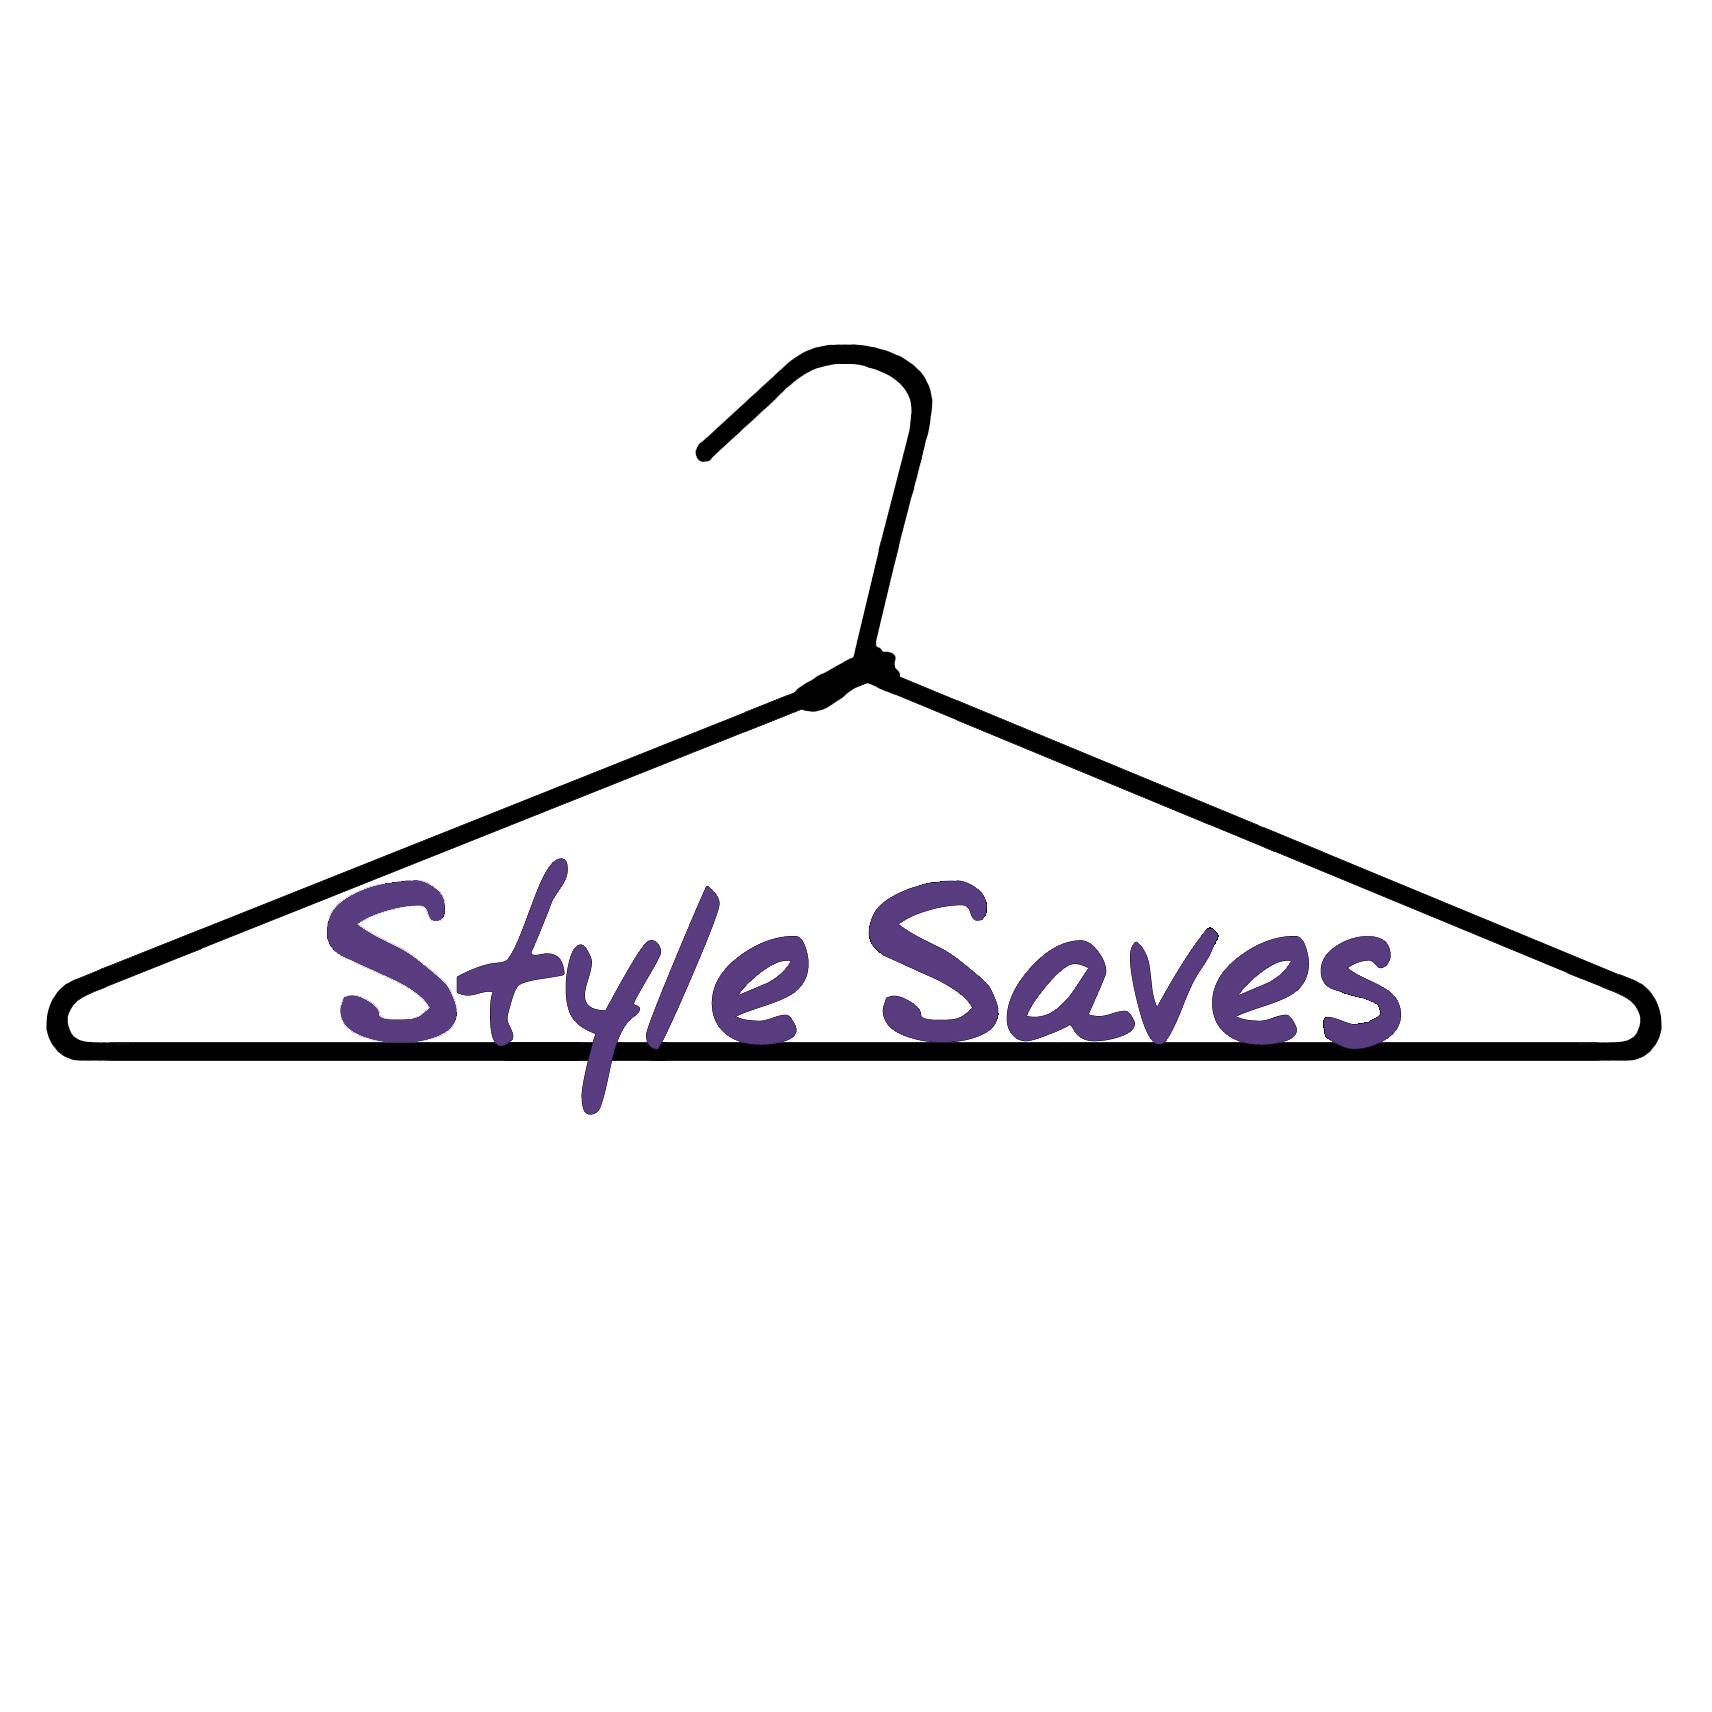 Style Saves logo.jpg